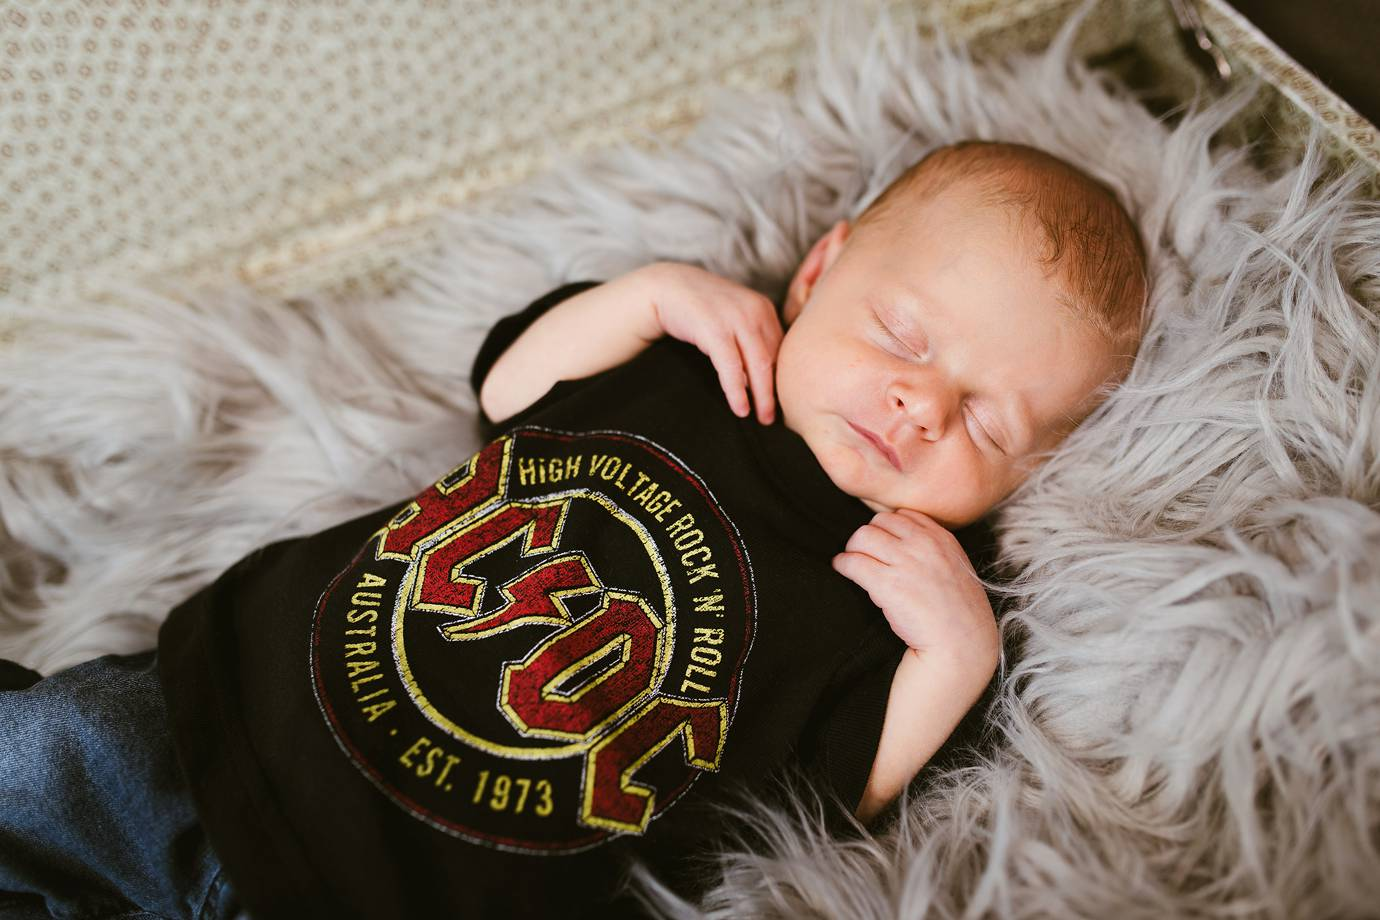 babyfotograf ritterhude 05 - Nika